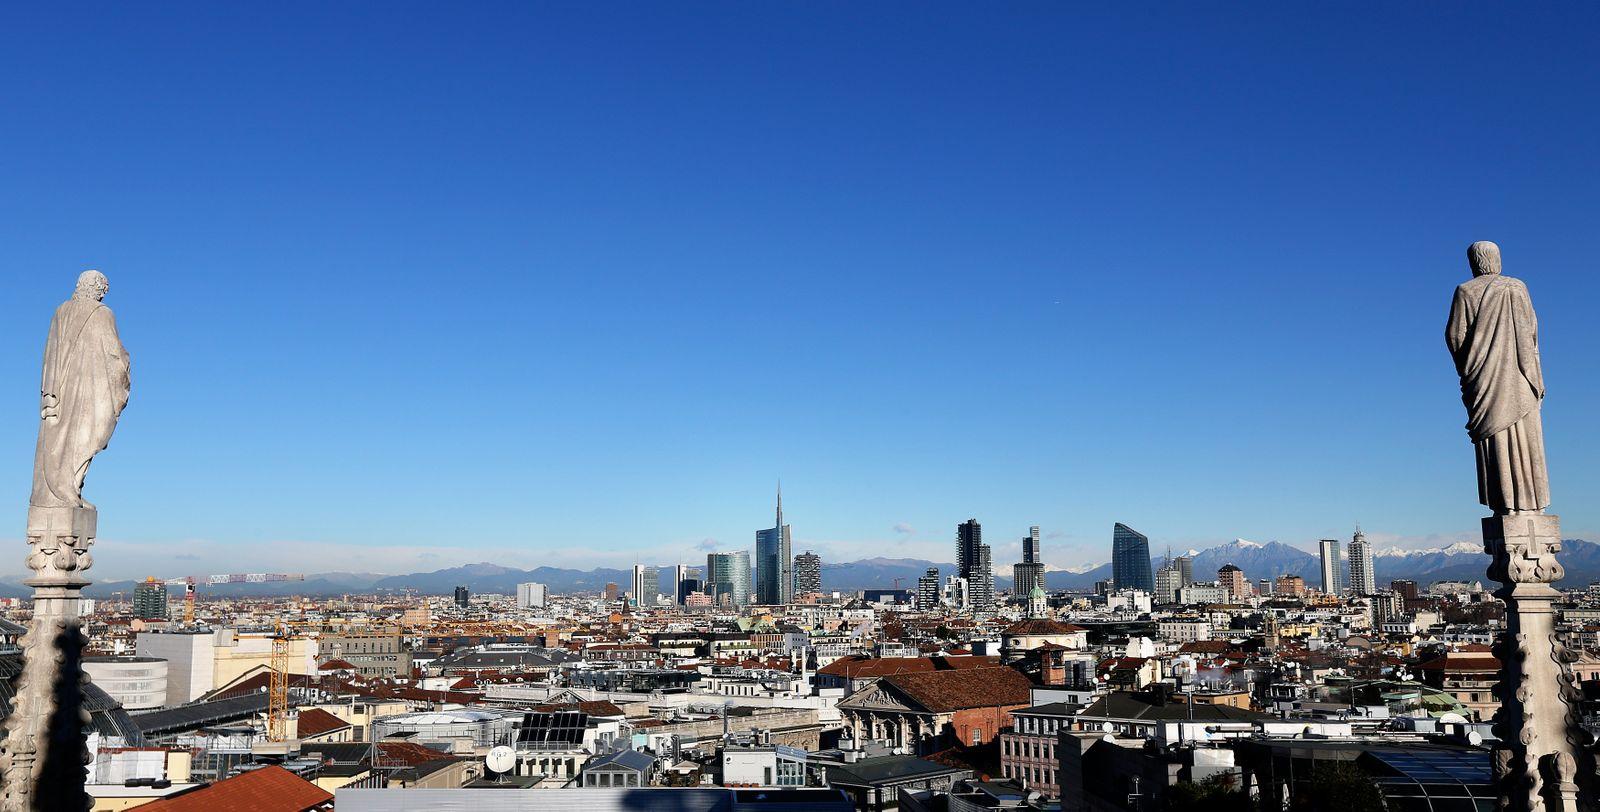 Italien / Mailand / Banken / Bankenviertel / Konjunktur